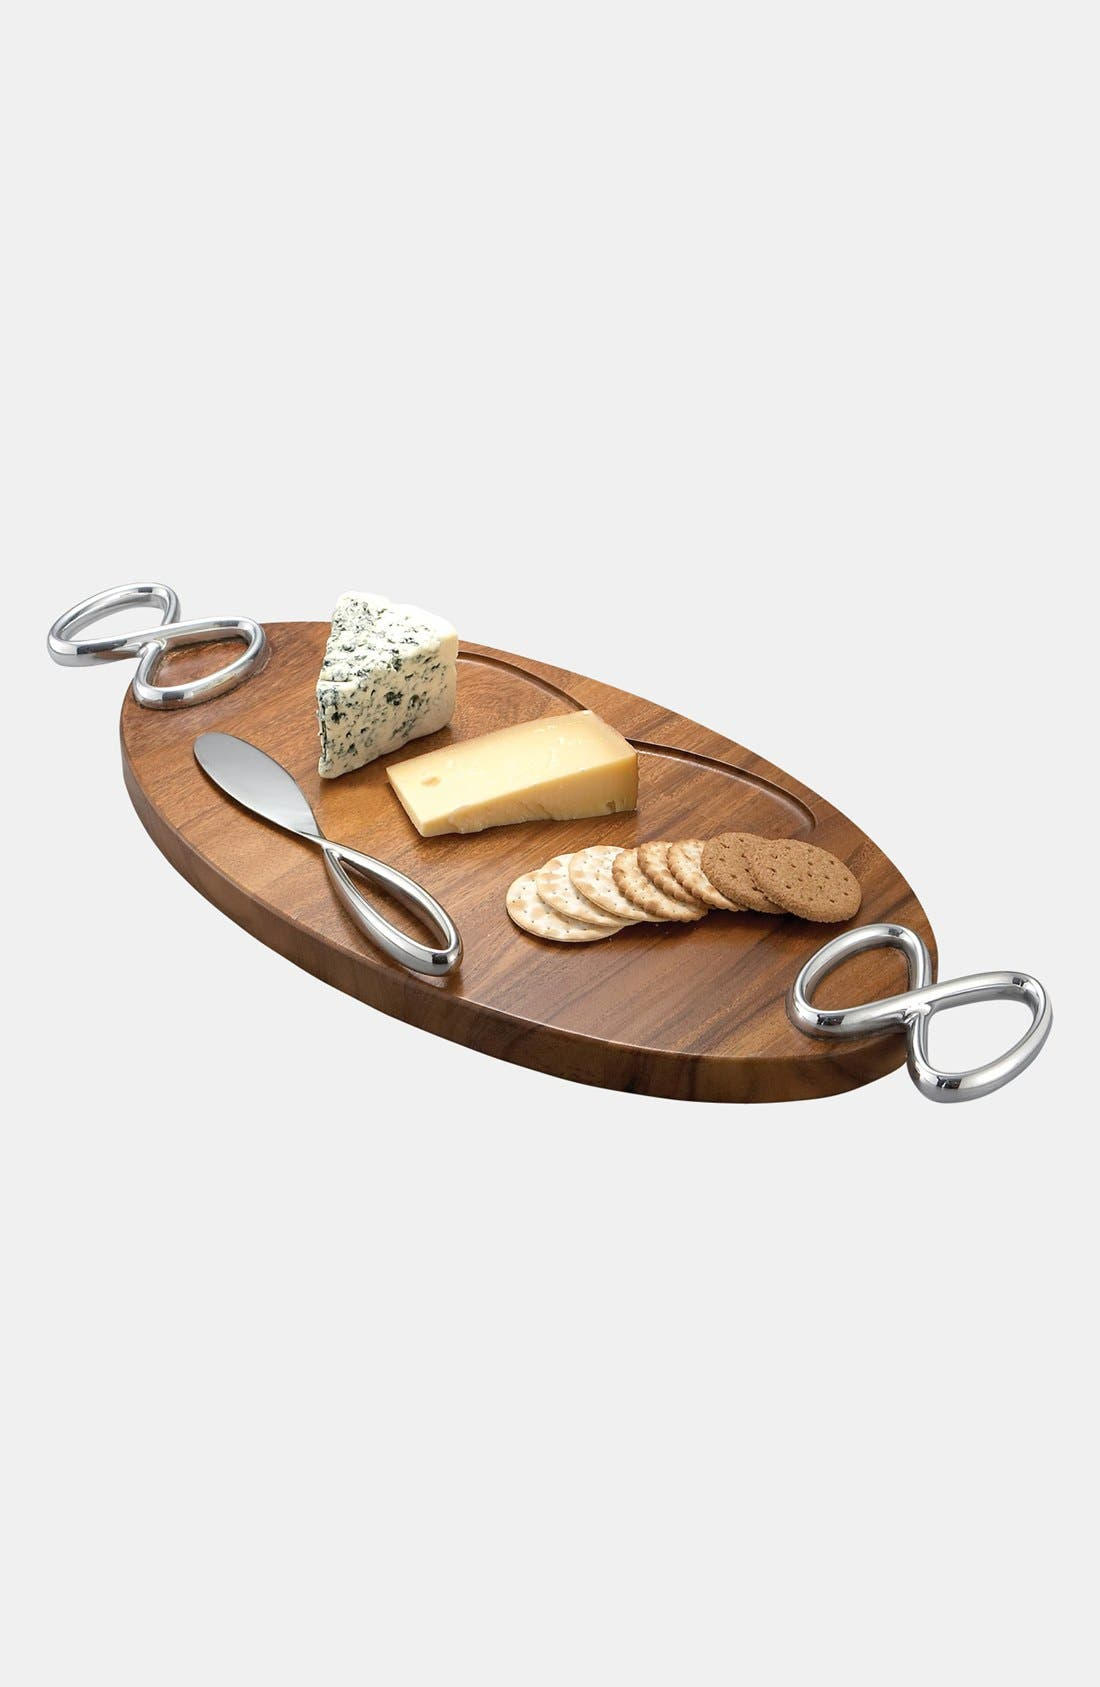 Main Image - Nambé Infinity Cheese Board & Knife